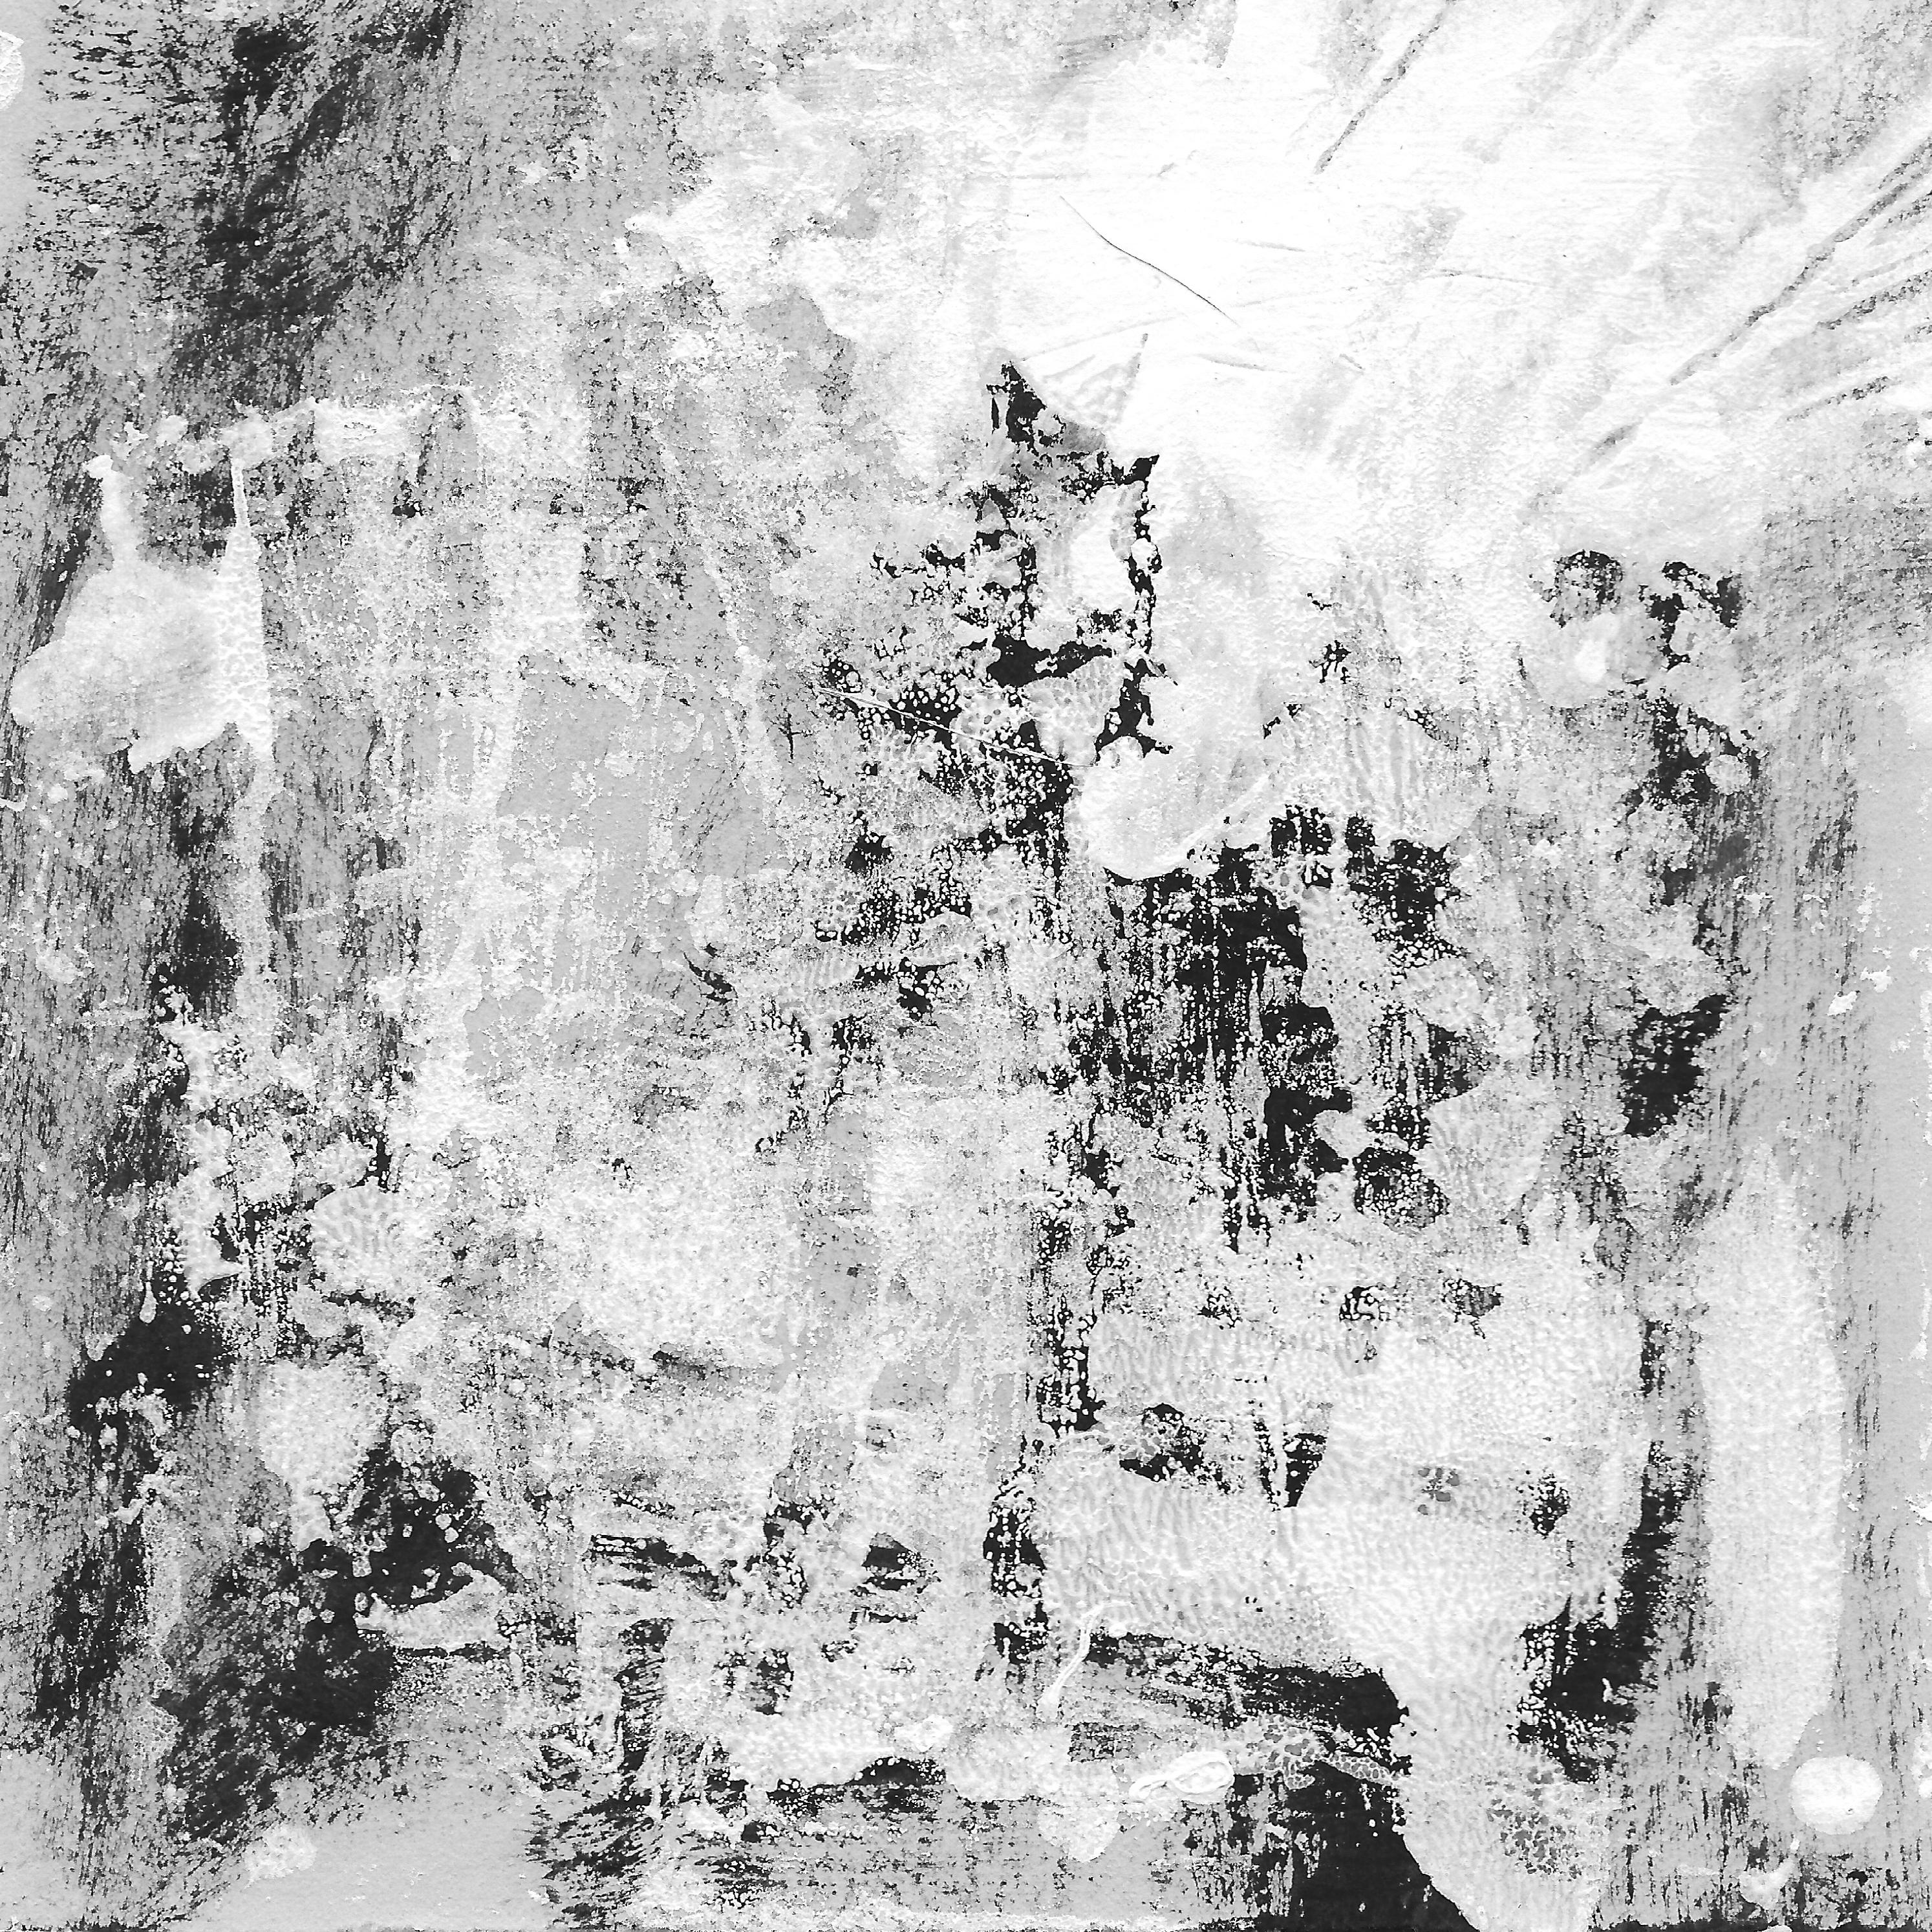 Number 144 (2017)